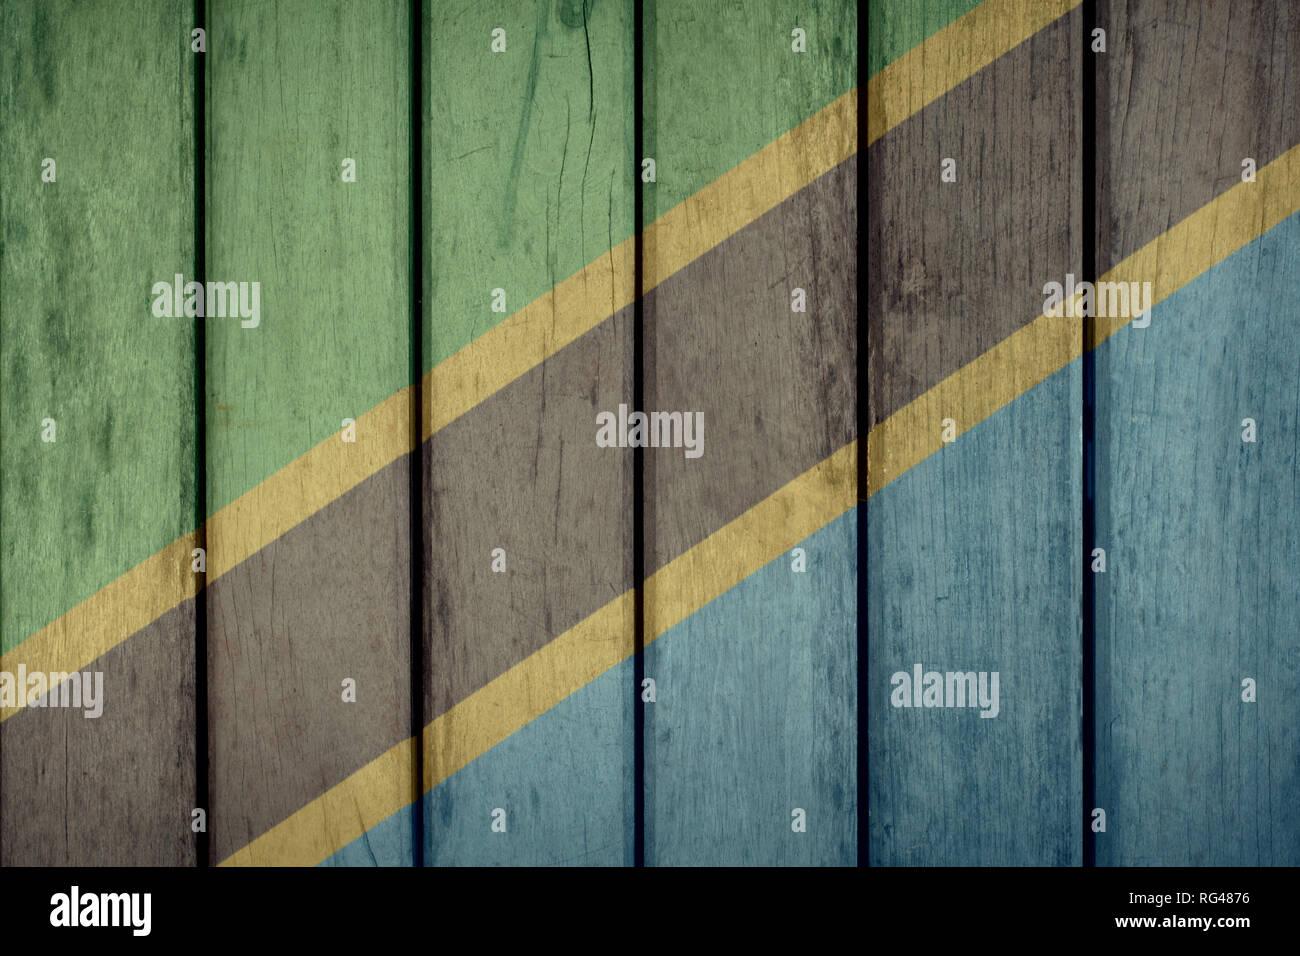 Tanzania Politics News Concept: Tanzanian Flag Wooden Fence - Stock Image